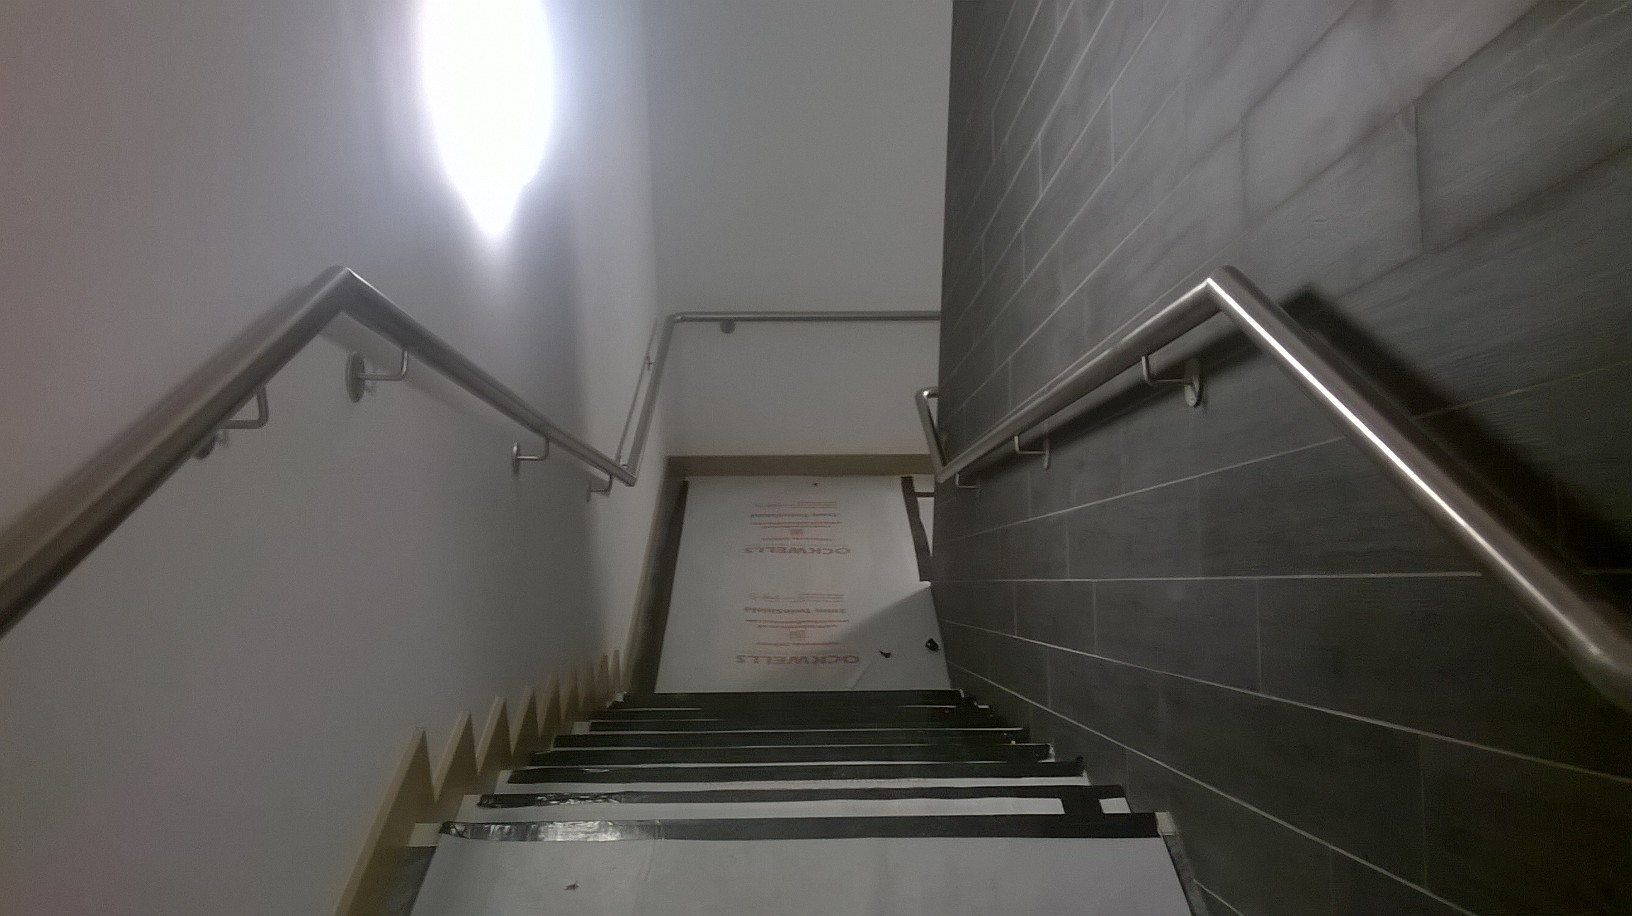 11 - Stainless Steel Handrail